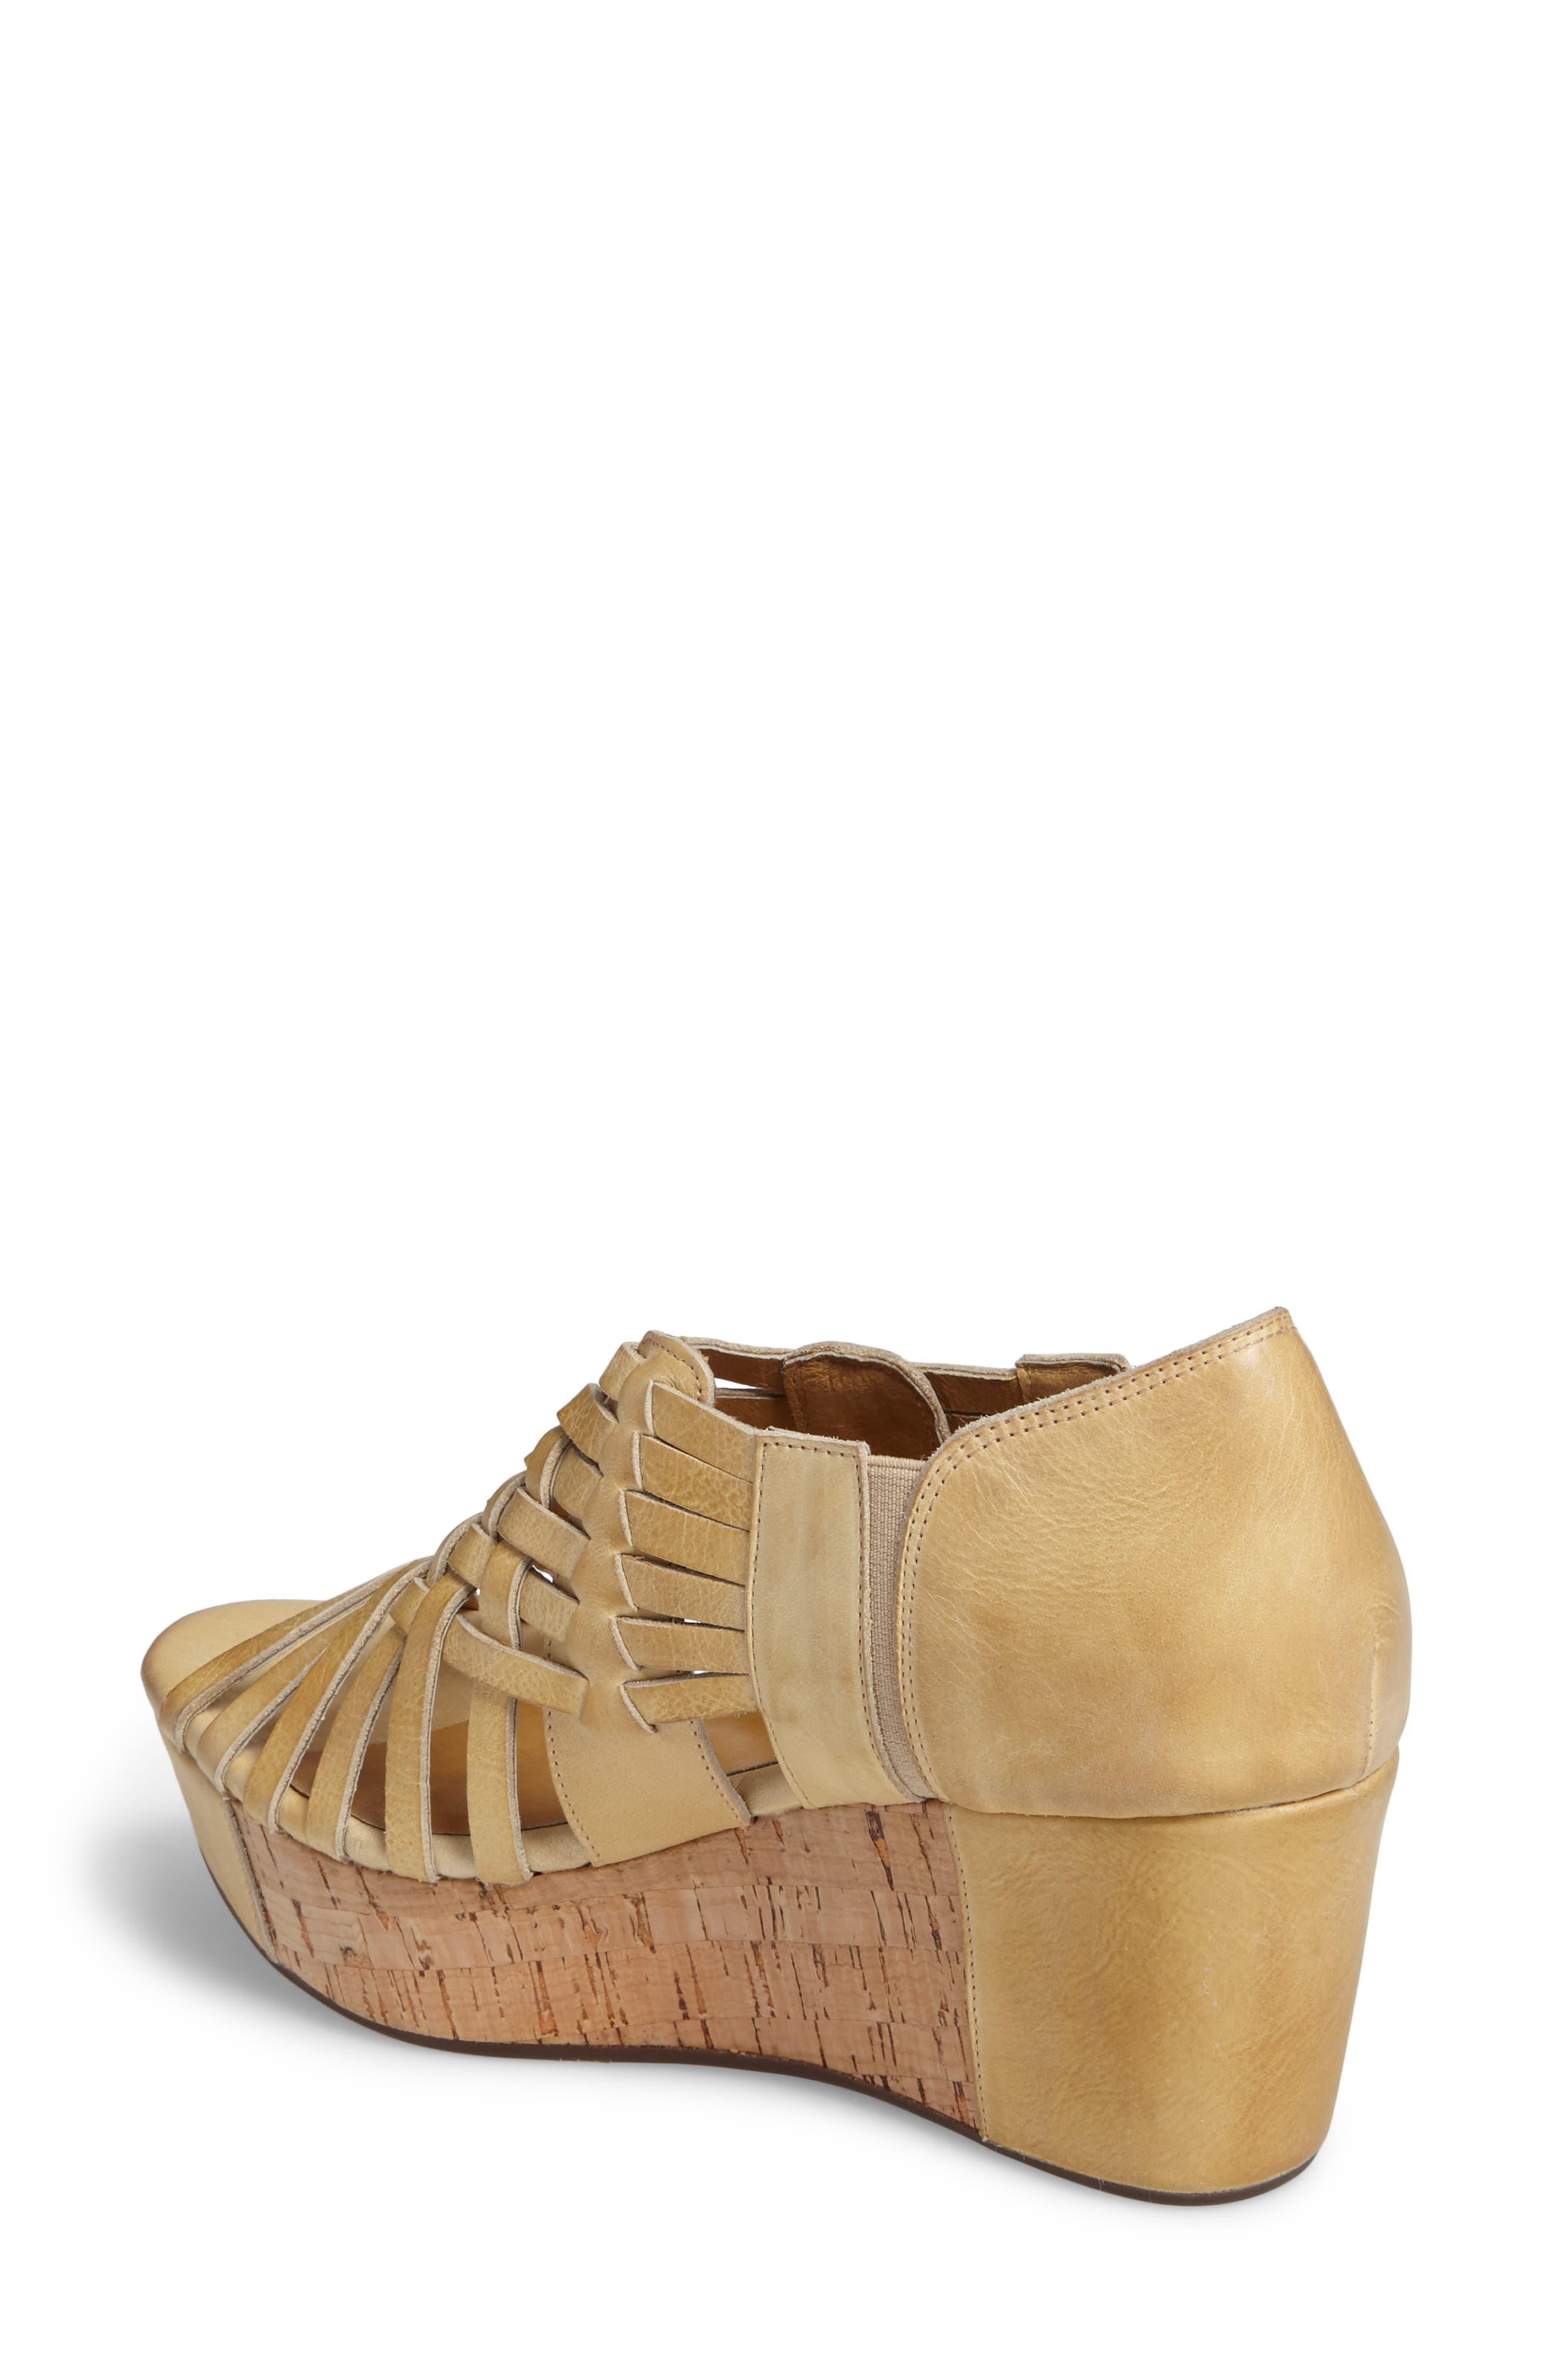 Vic Platform Sandal,                             Alternate thumbnail 2, color,                             Natural Leather